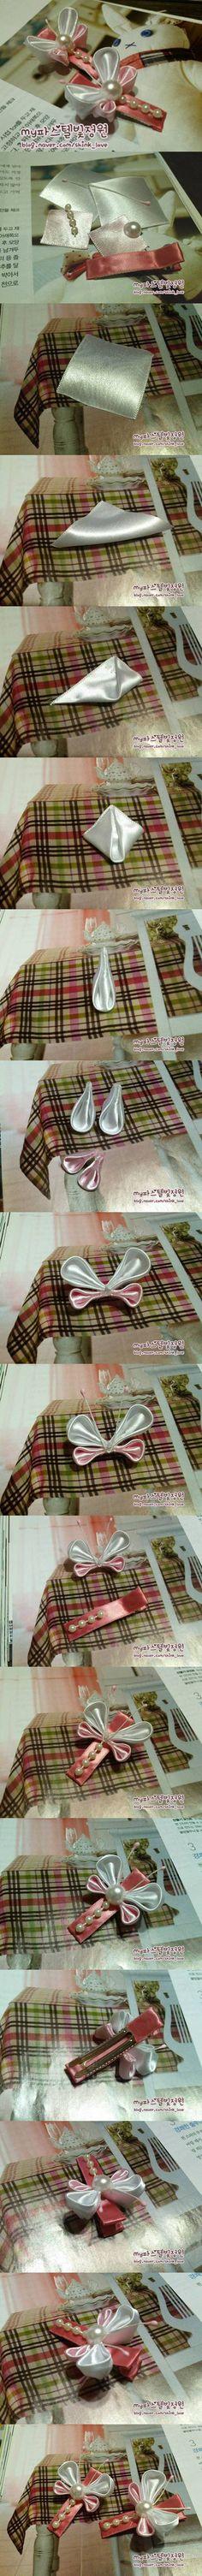 DIY Ribbon Butterfly Hair Clip